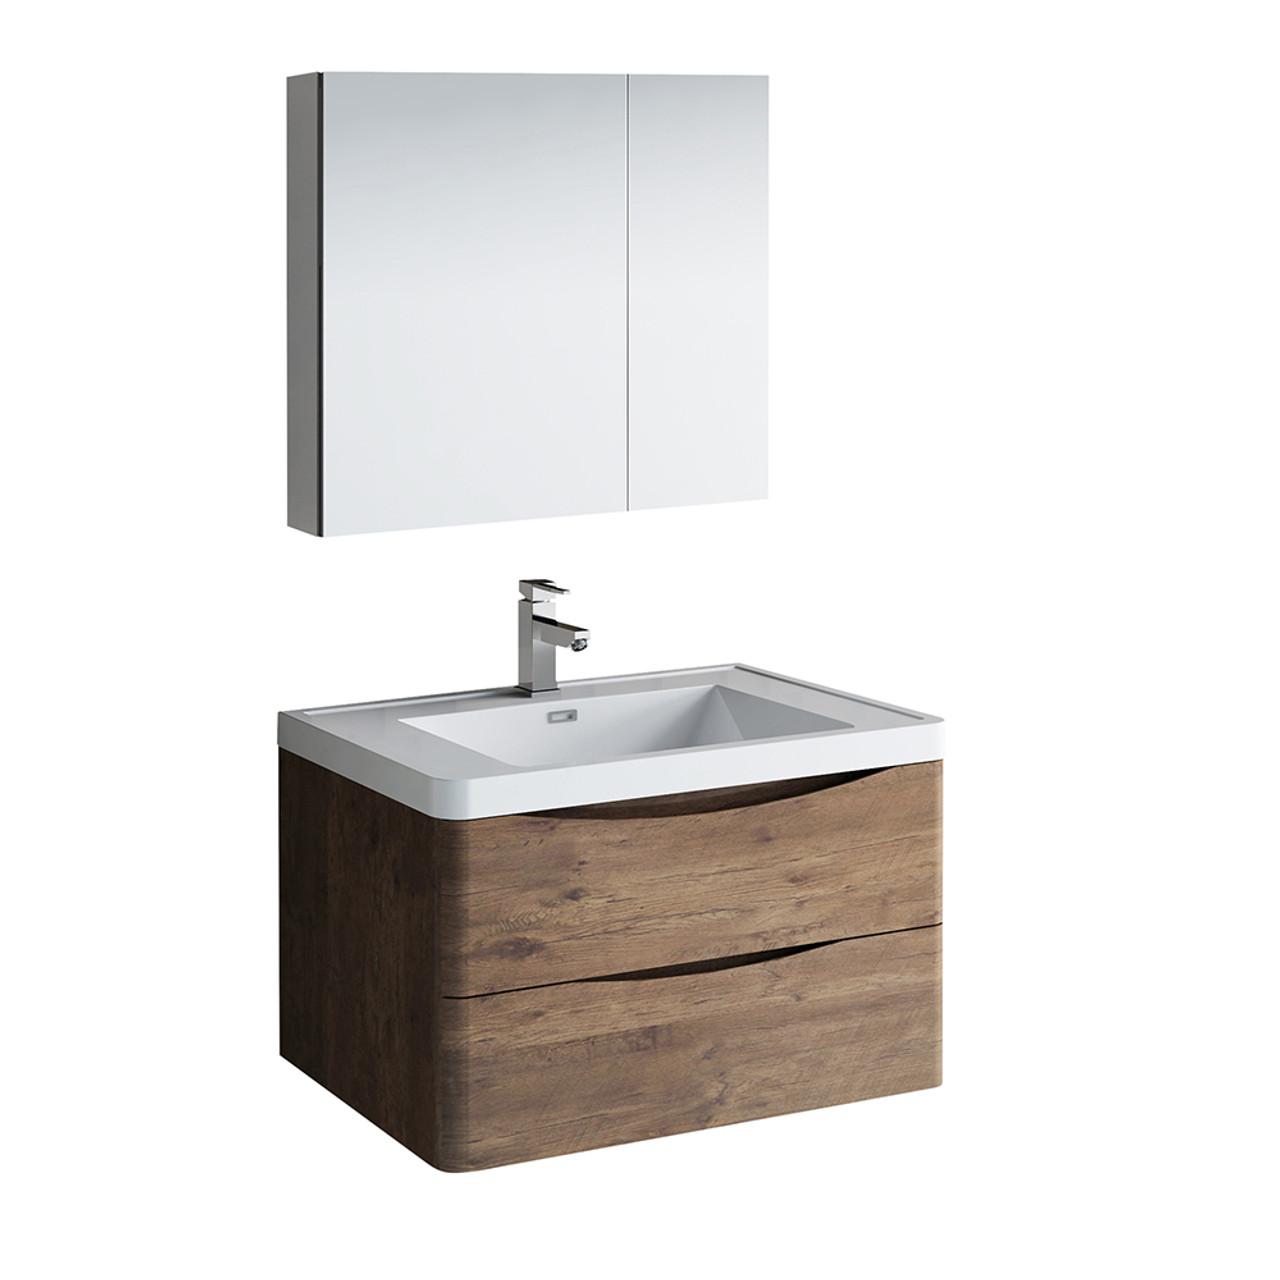 Tuscany 32 Wall Hung Modern Bathroom Vanity W Medicine Cabinet Fvn9032 Residential Baths